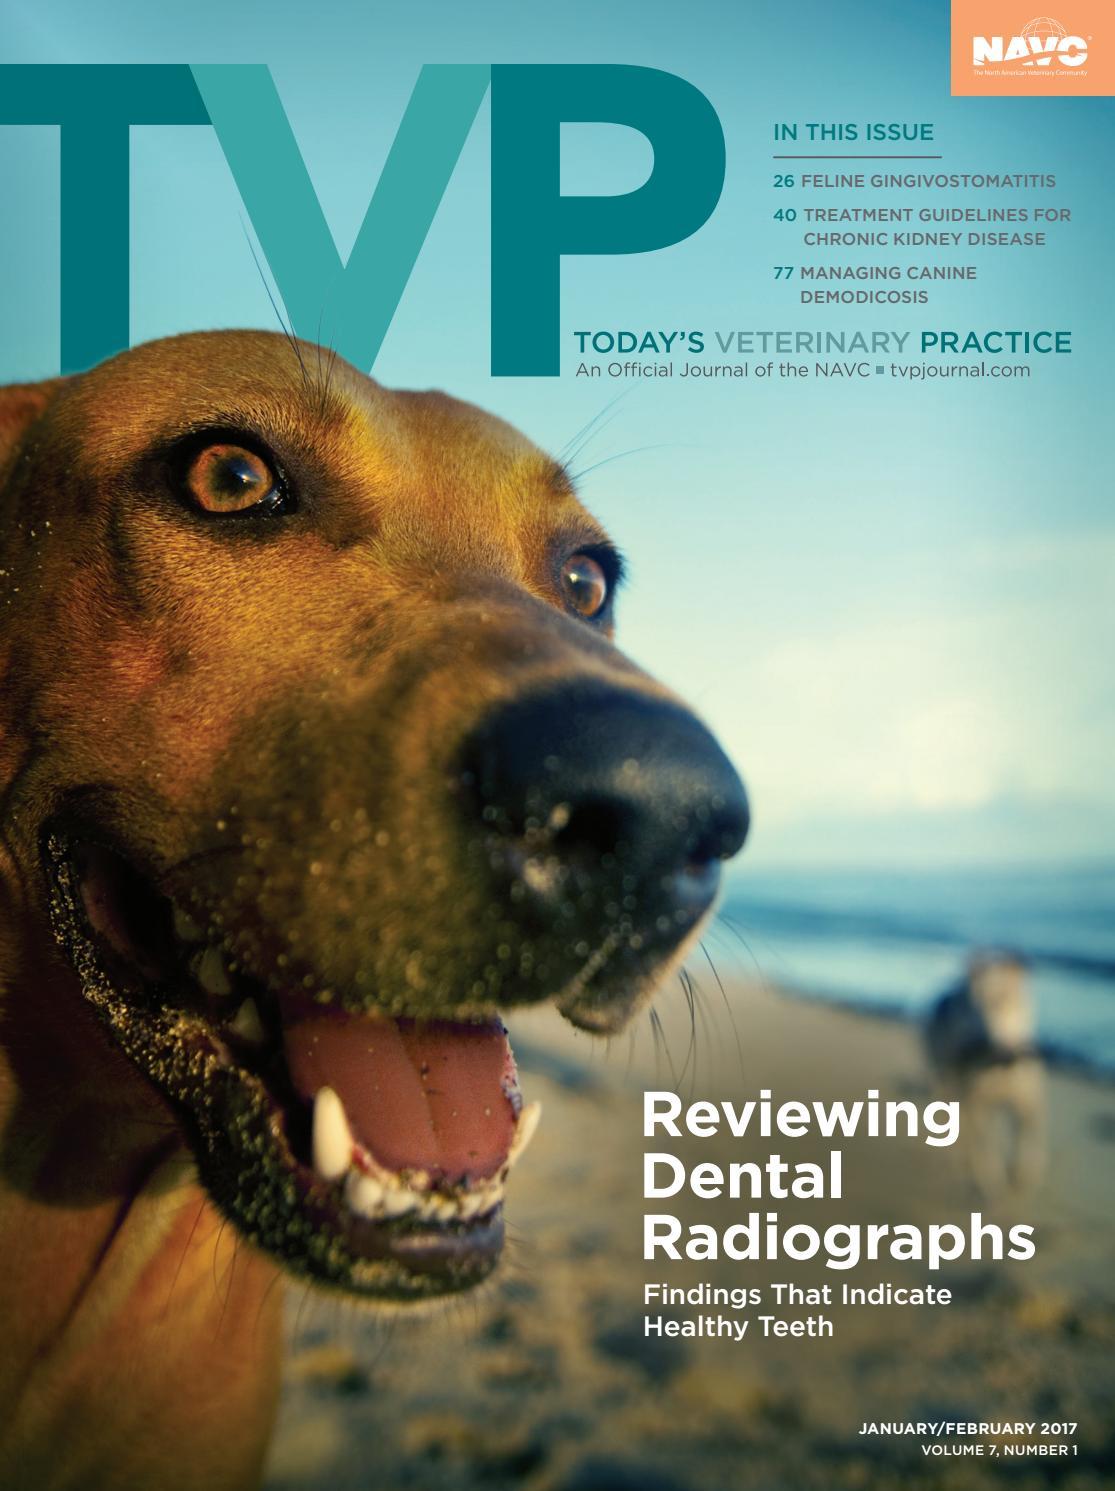 Today's Veterinary Practice, January 2017 by davidpsu - issuu